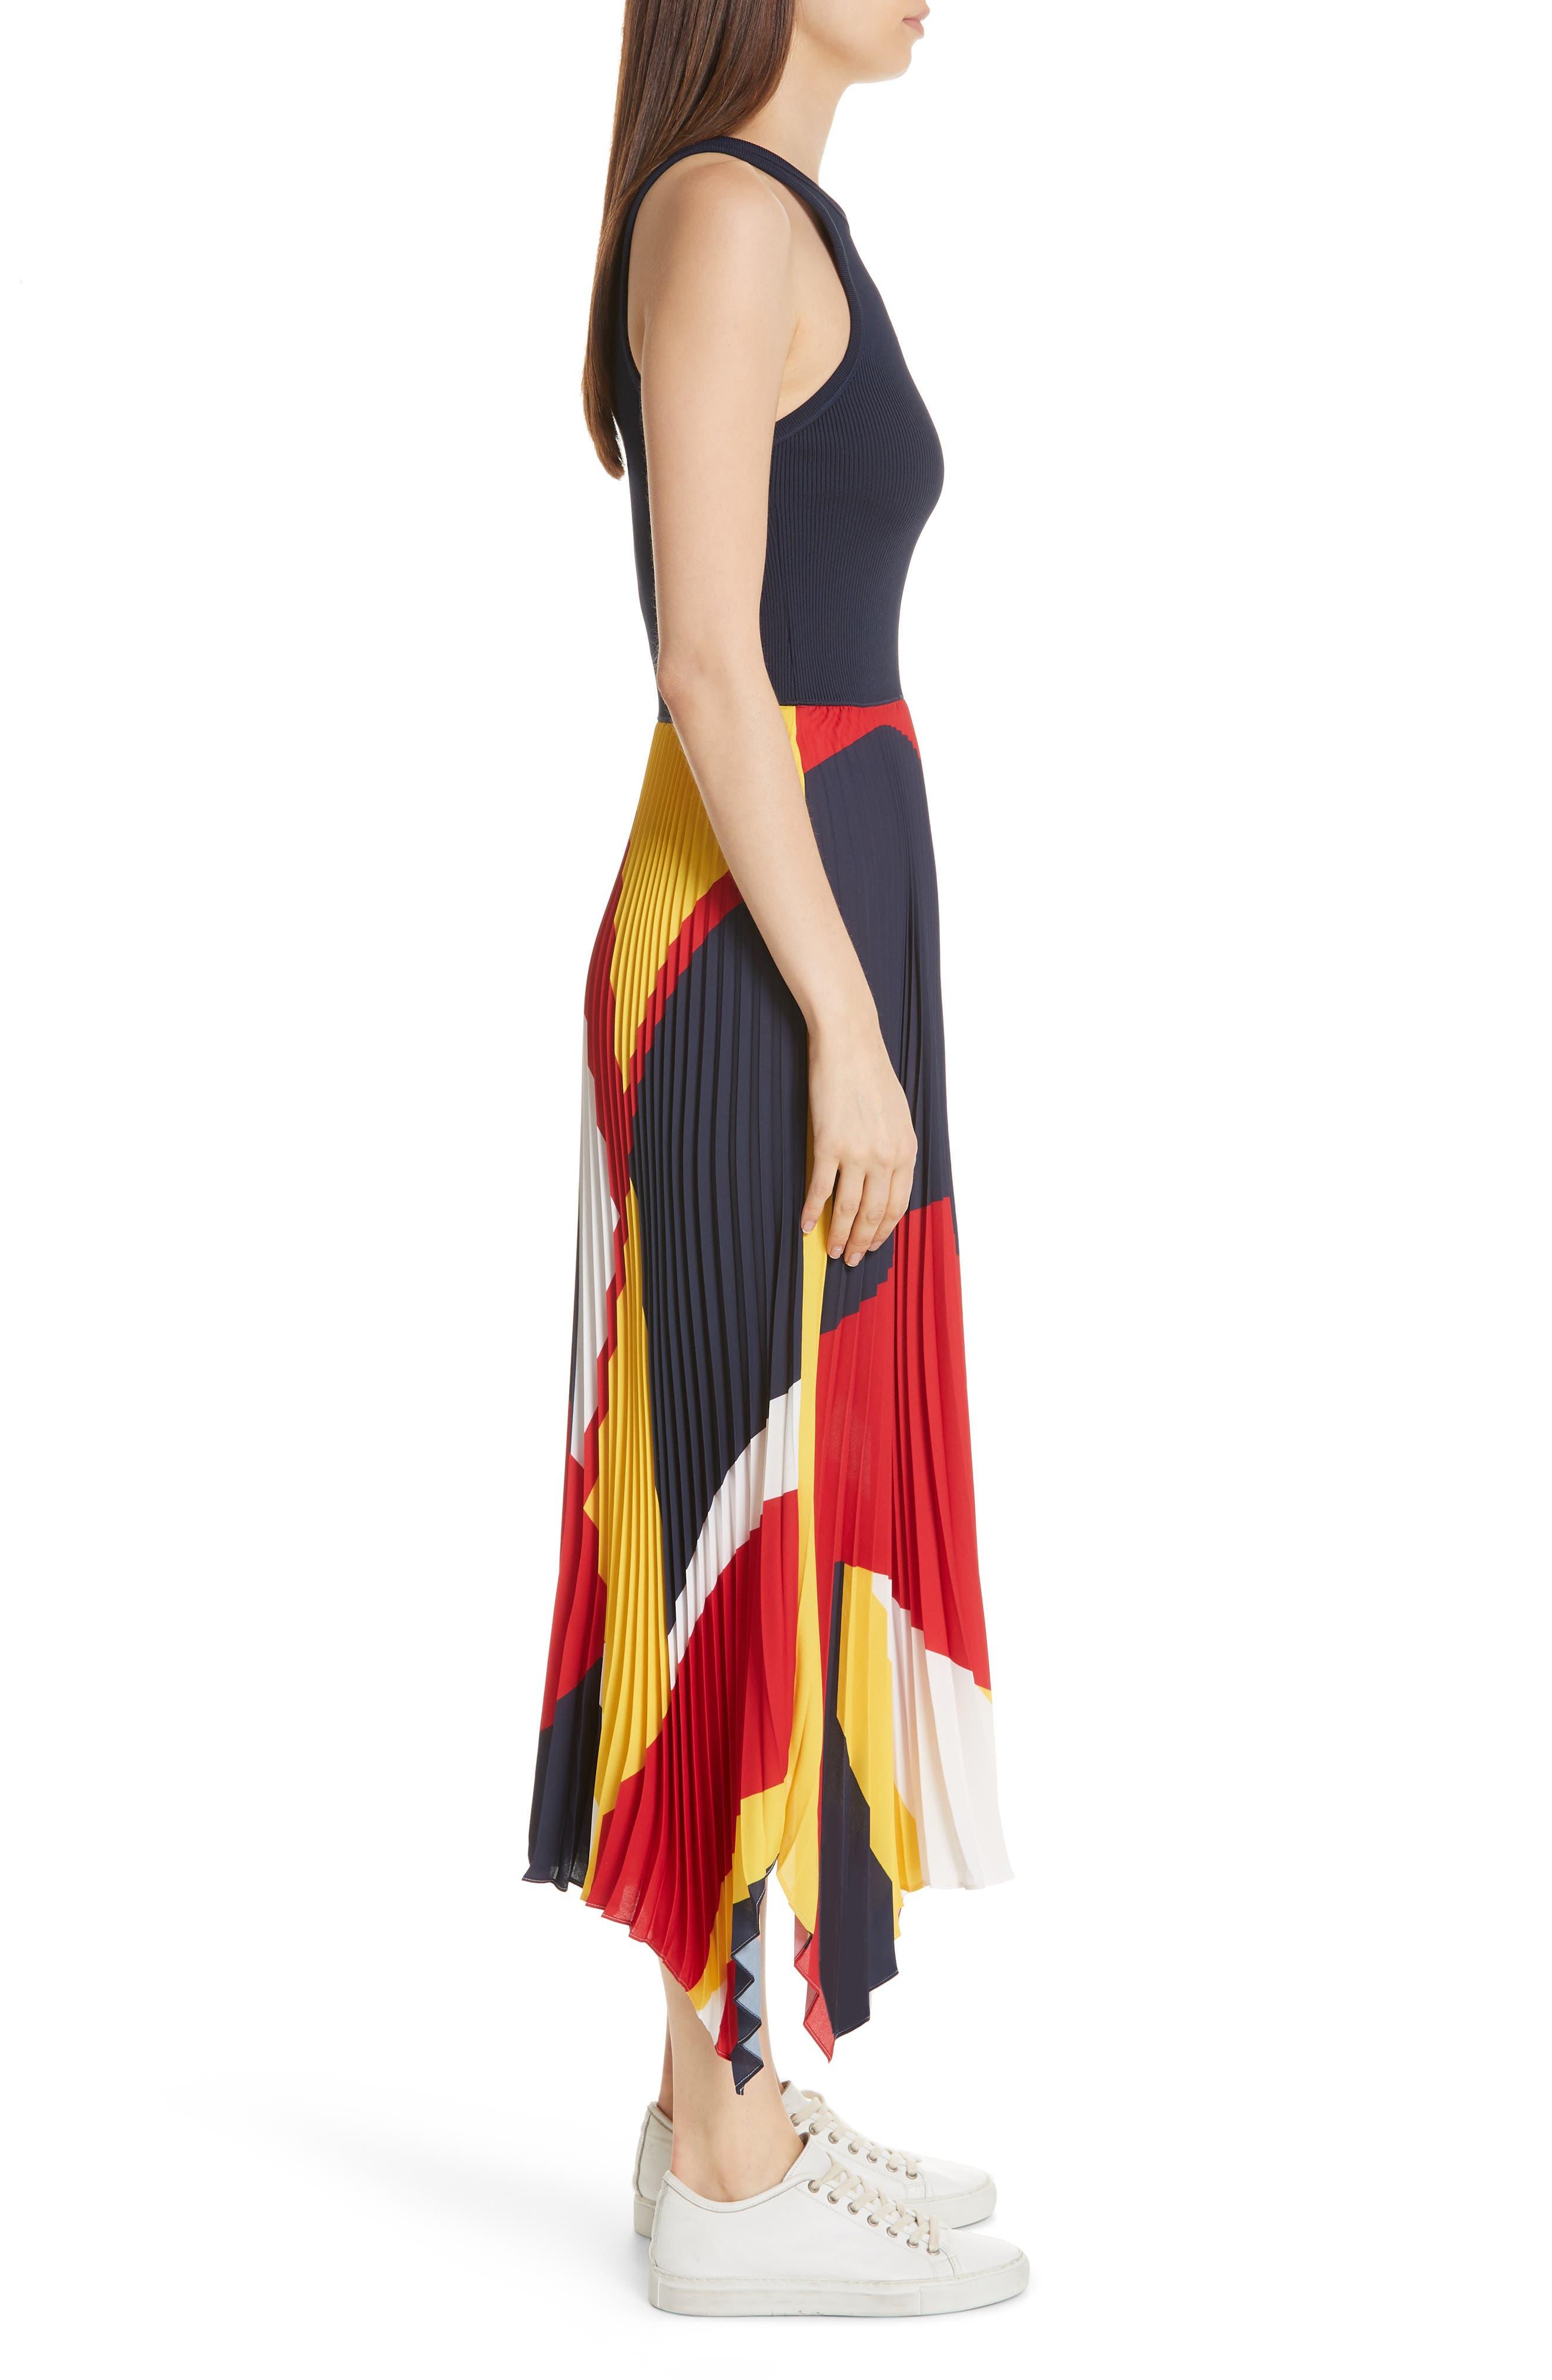 Alyah Mixed Media Dress,                             Alternate thumbnail 3, color,                             410